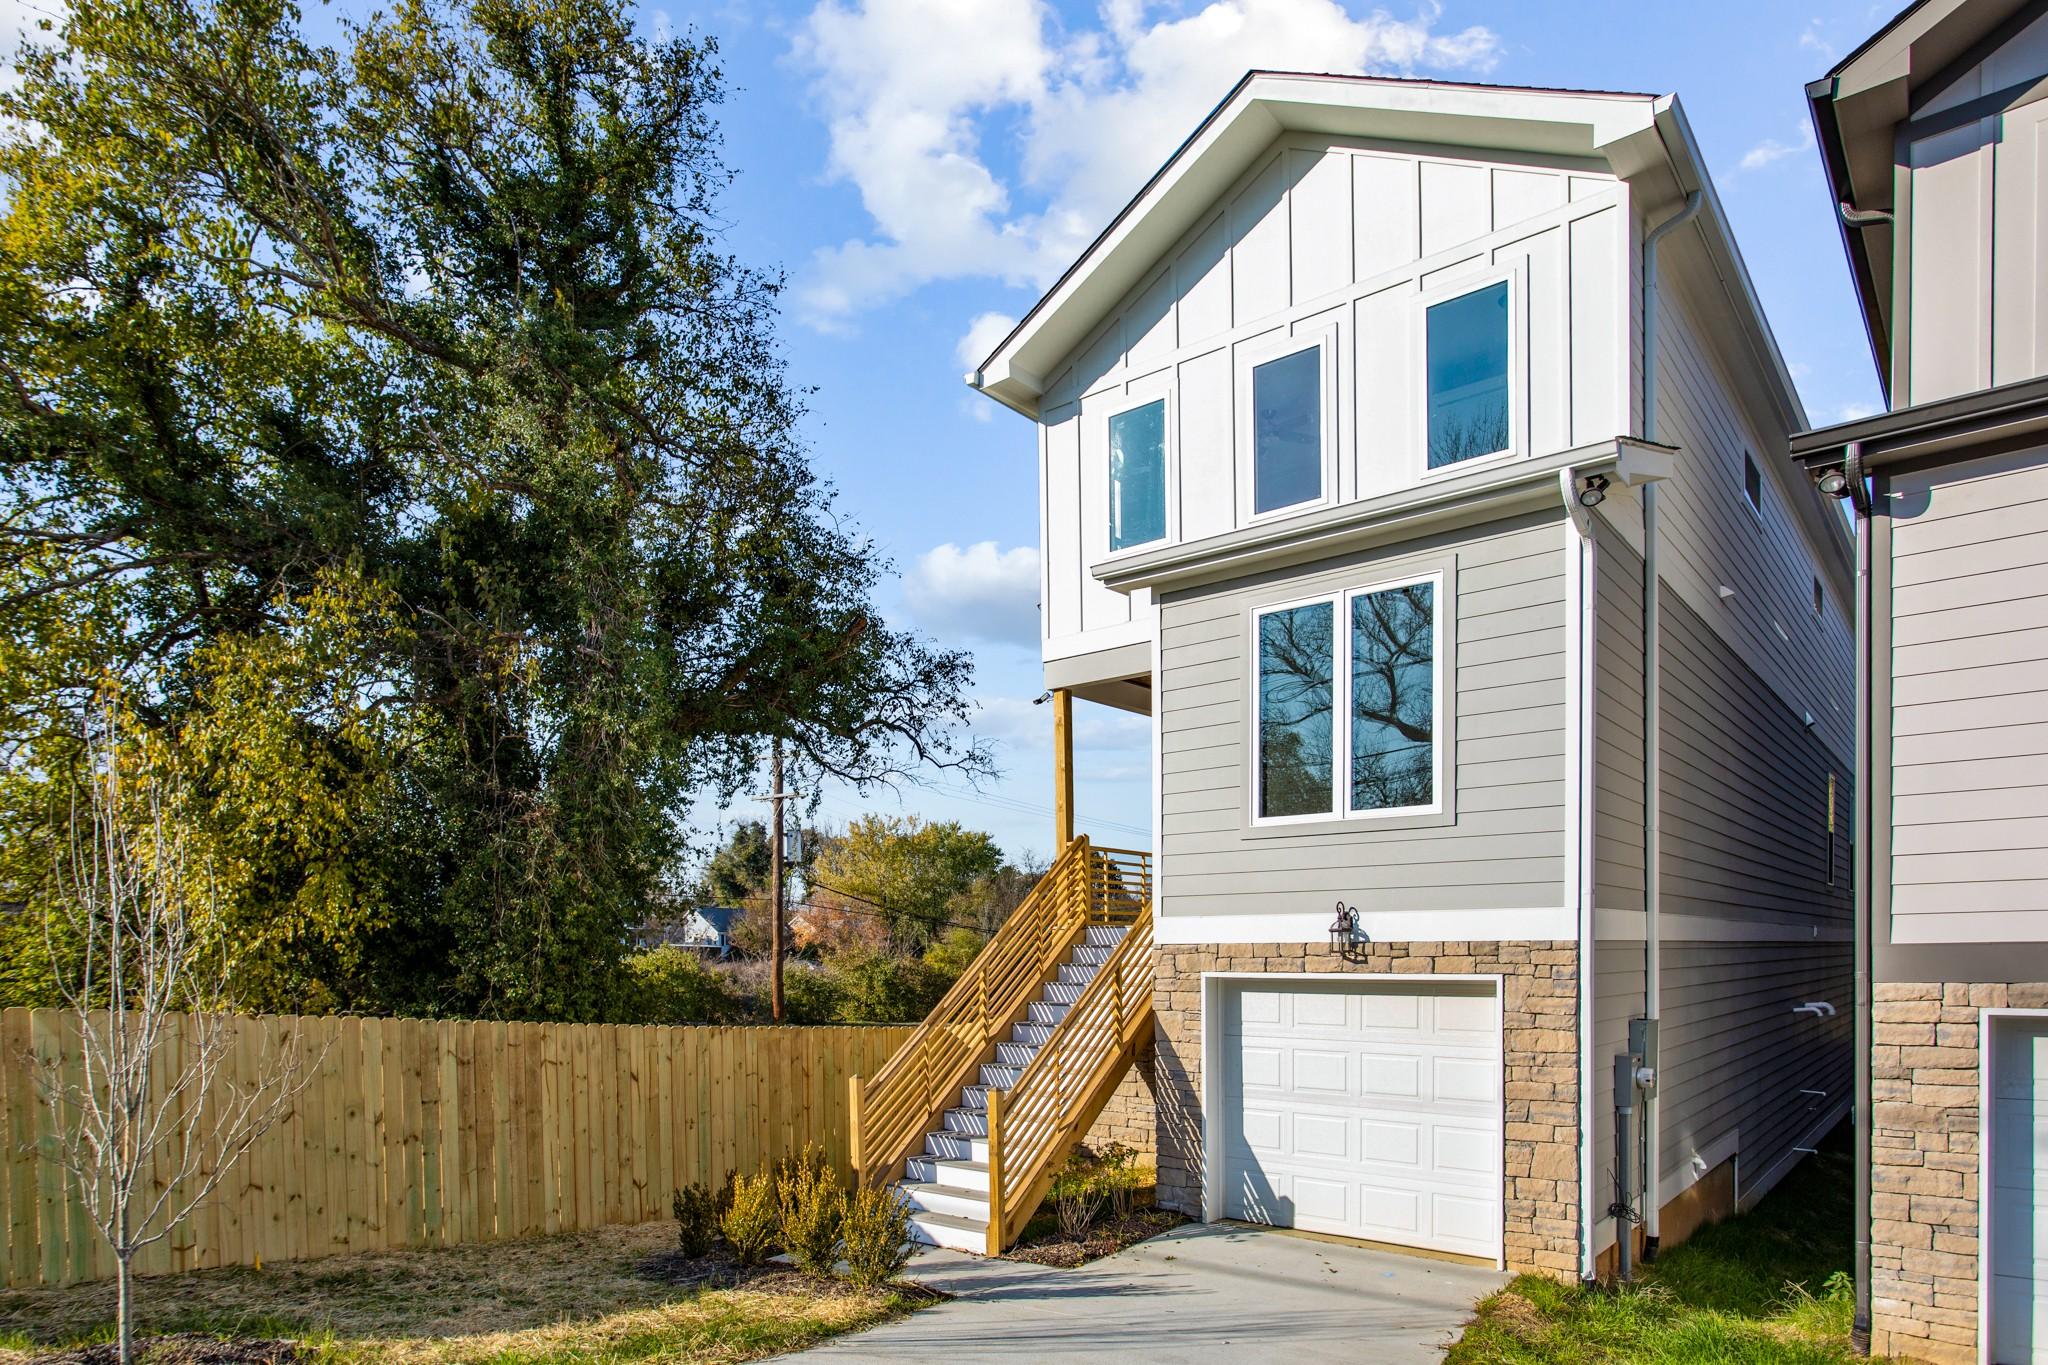 1301A Litton Ave, Nashville, TN 37216 - Nashville, TN real estate listing